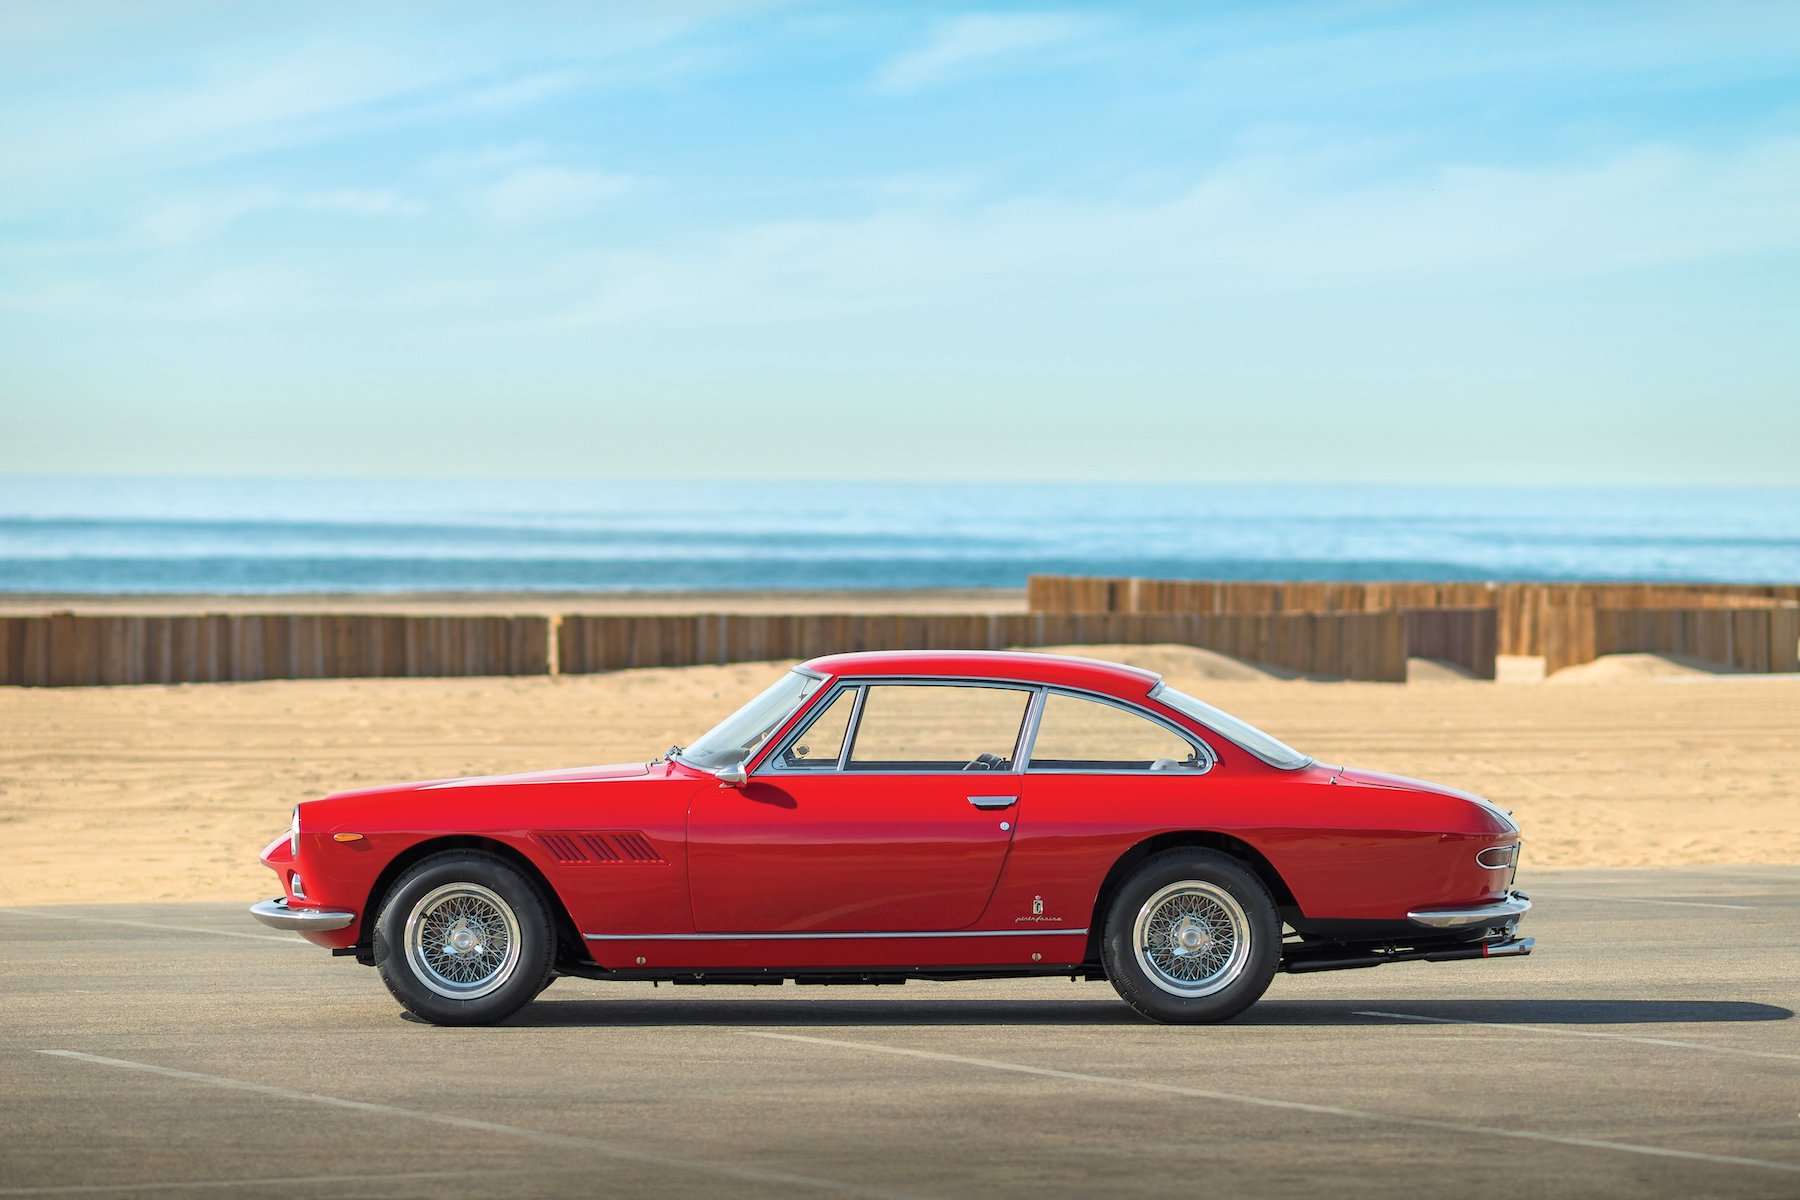 World's Oldest Ferrari 'Barn Find' Uncovered In Australia... & It's Beautiful